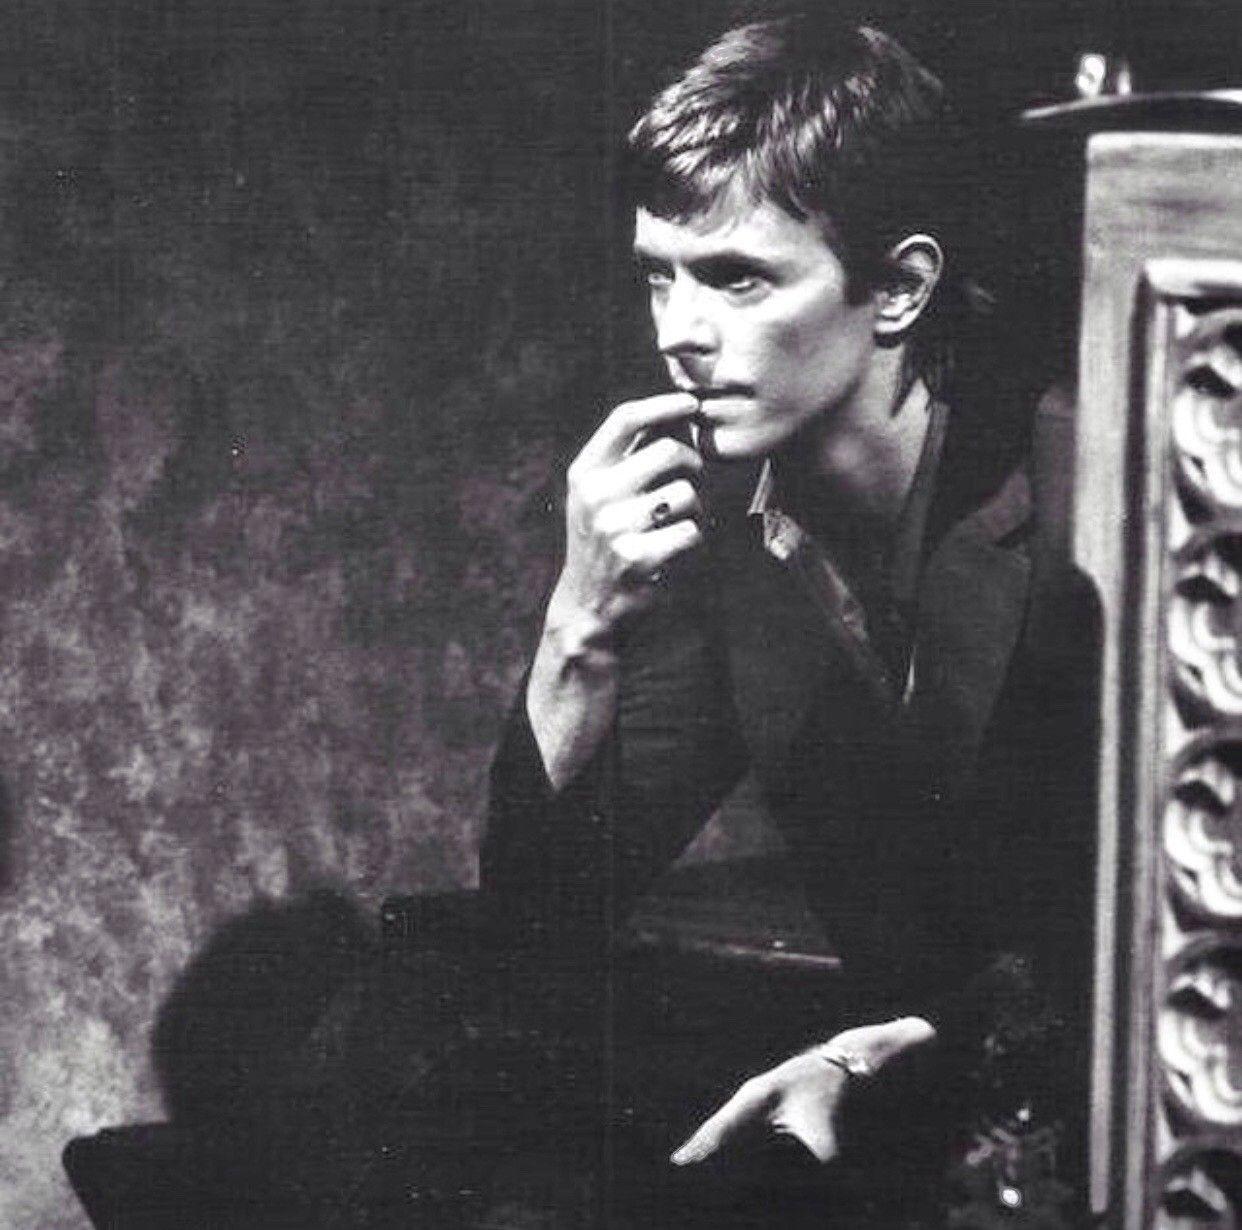 David Bowie Berlin Era 1977 David Bowie Starman David Bowie David Bowie Berlin